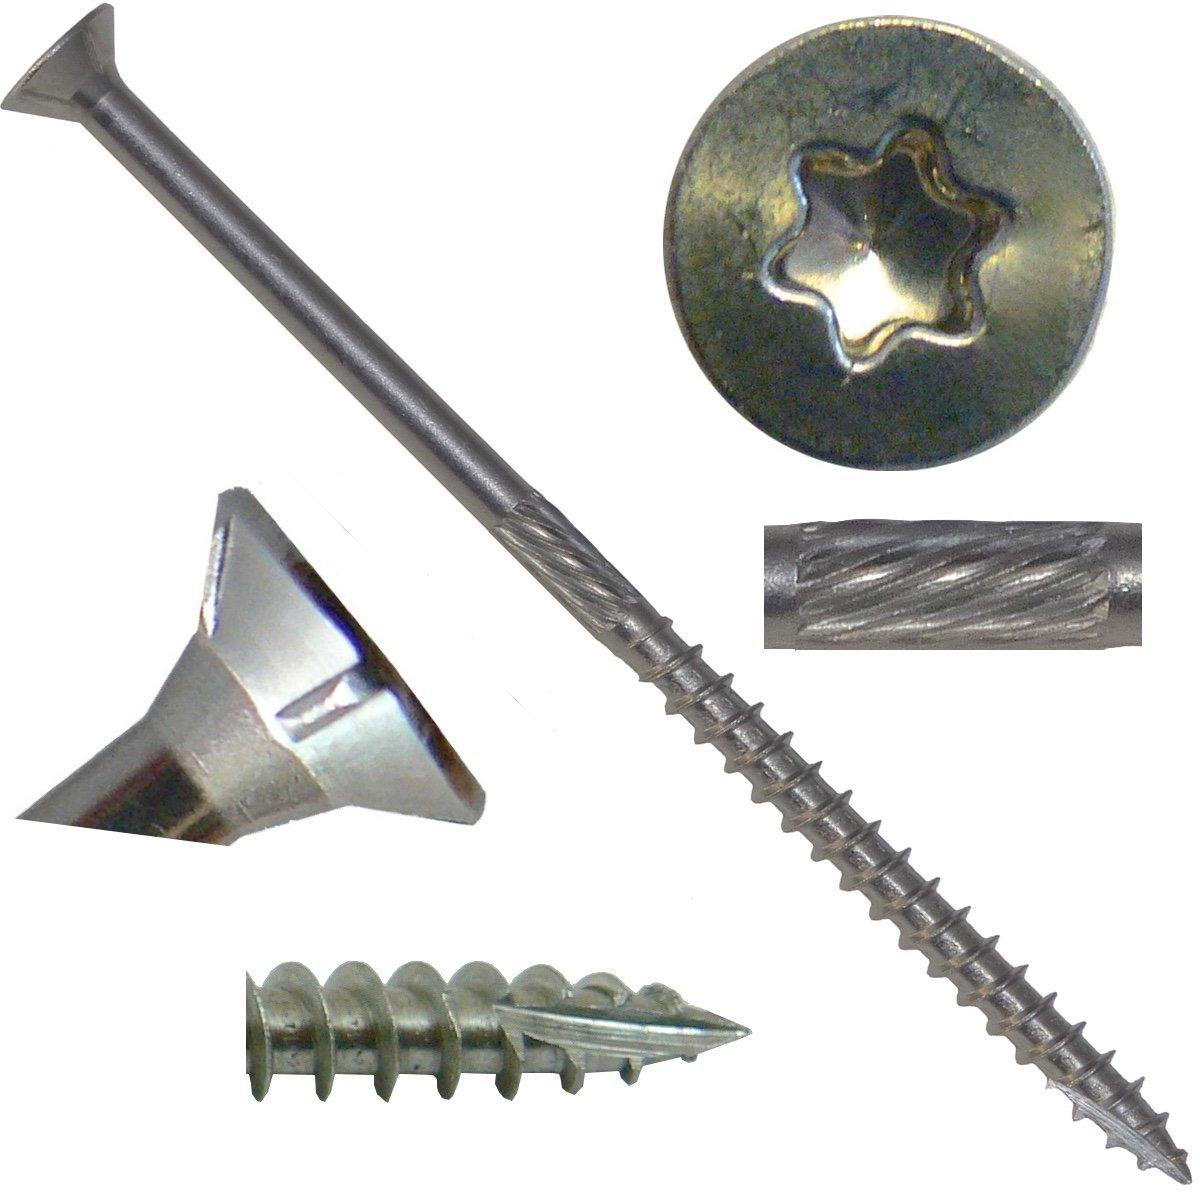 #10 x 4'' Silver Star Stainless Steel Wood Screw Torx/Star Drive Head (Full Box - 1000 Approx. Screw Count) - Grade 305 Stainless Steel Torx/Star Drive Wood Screws